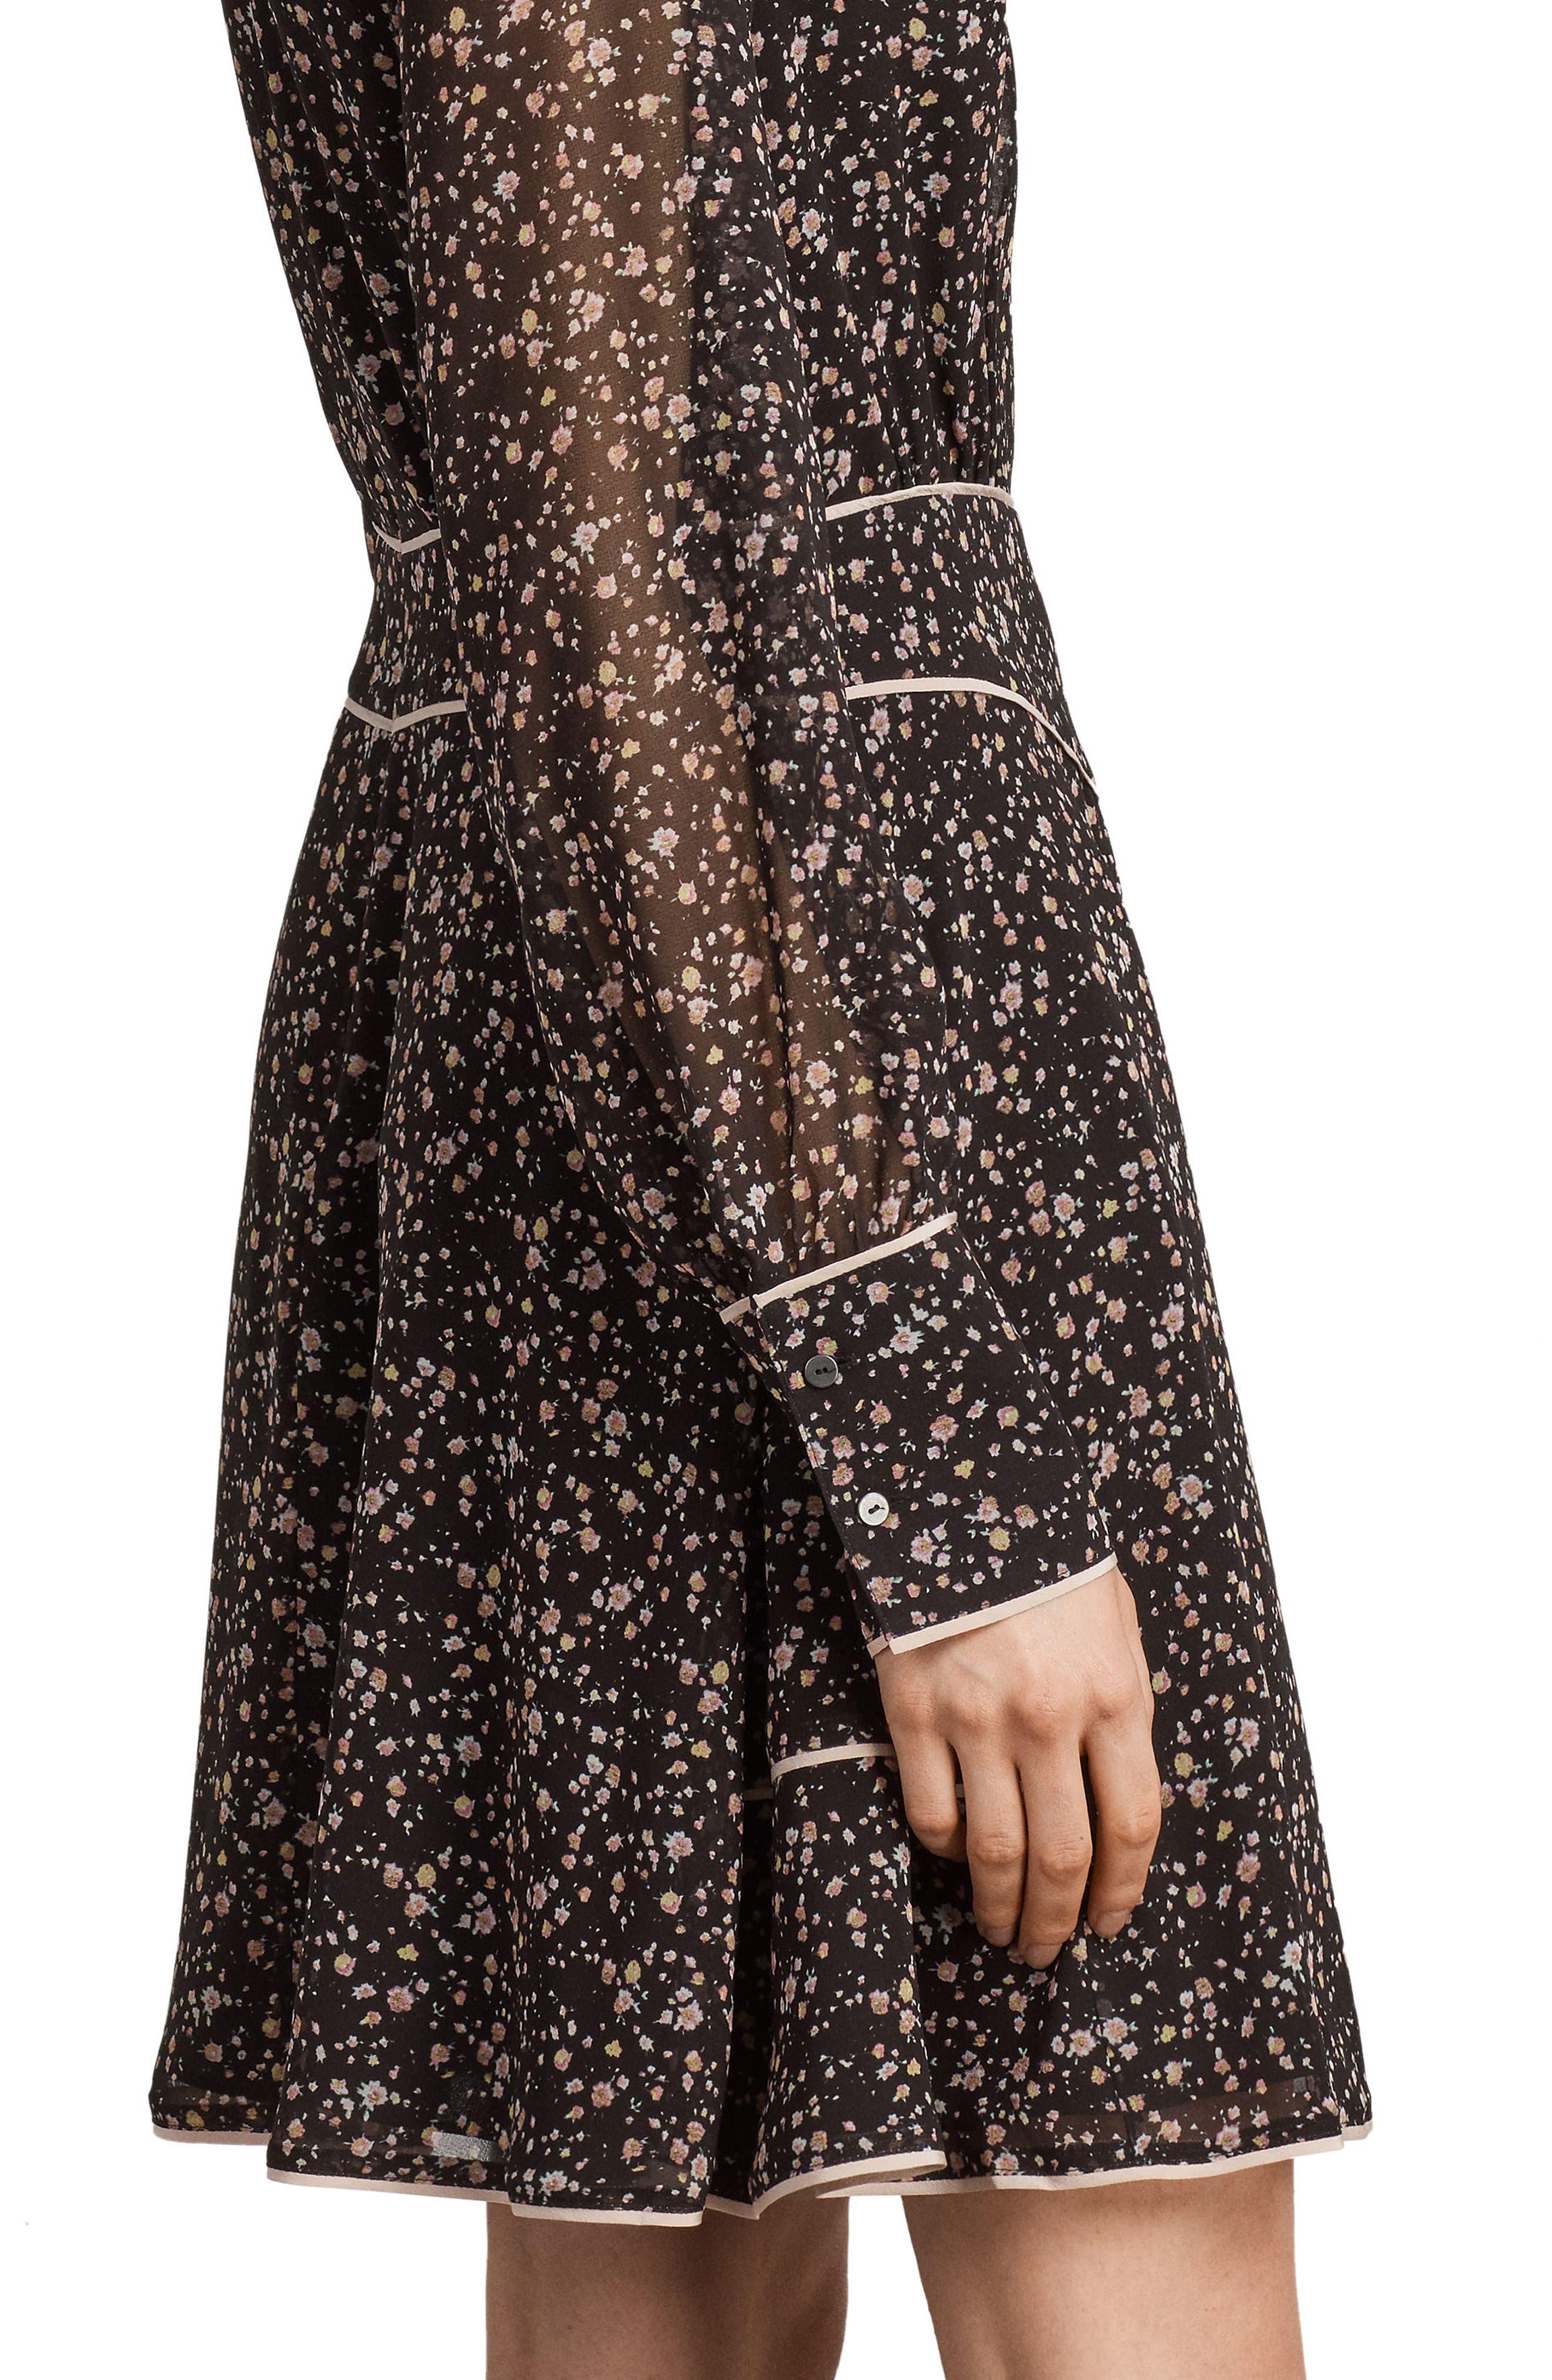 Kay Pepper Floral Print Dress,                             Alternate thumbnail 4, color,                             001